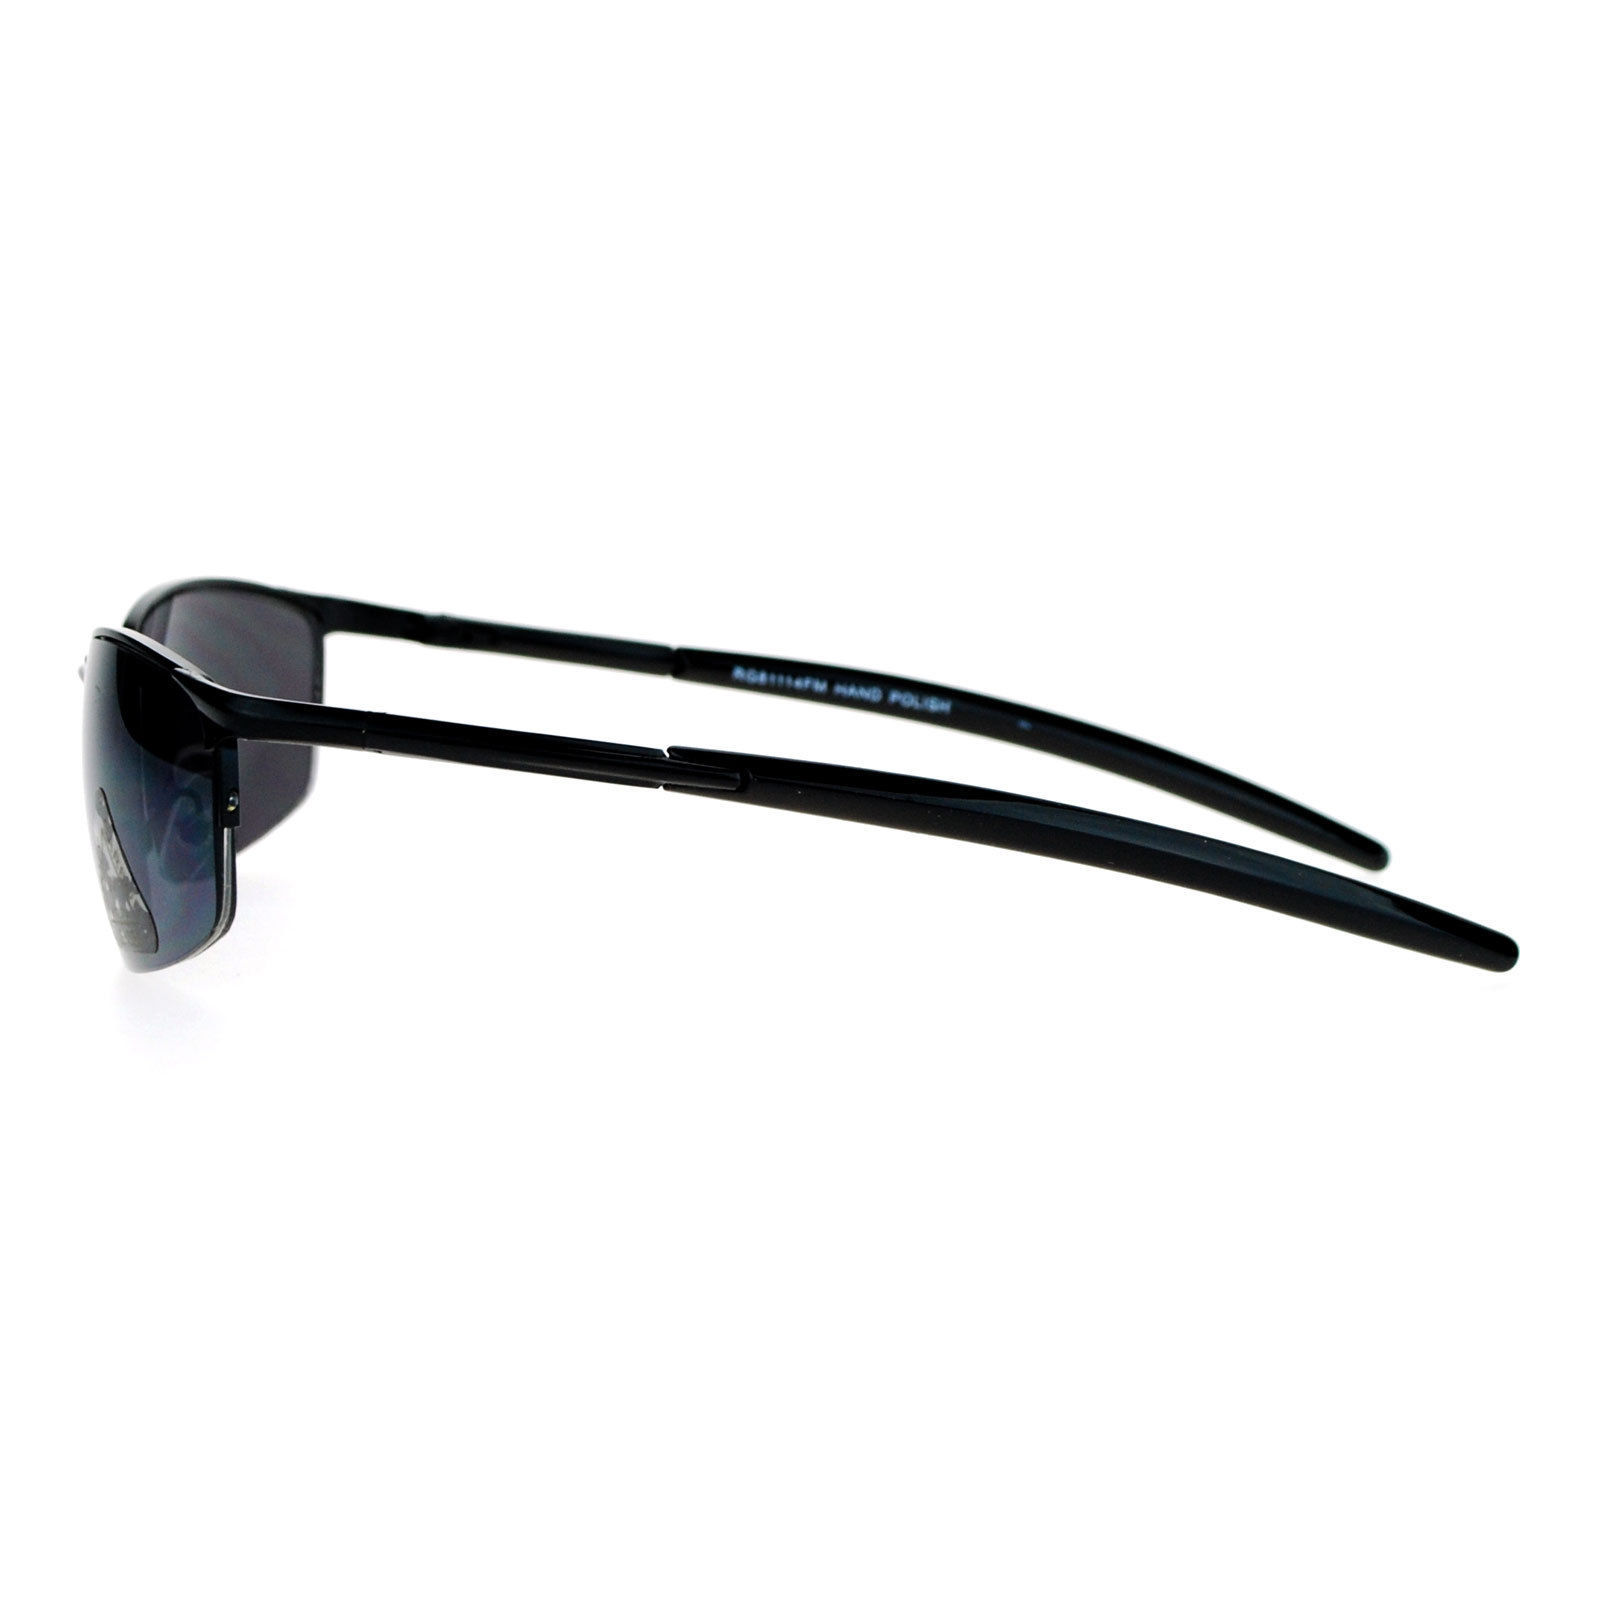 Oval Rectangular Sunglasses Half Rim Unisex Fashion Spring Hinge UV 400